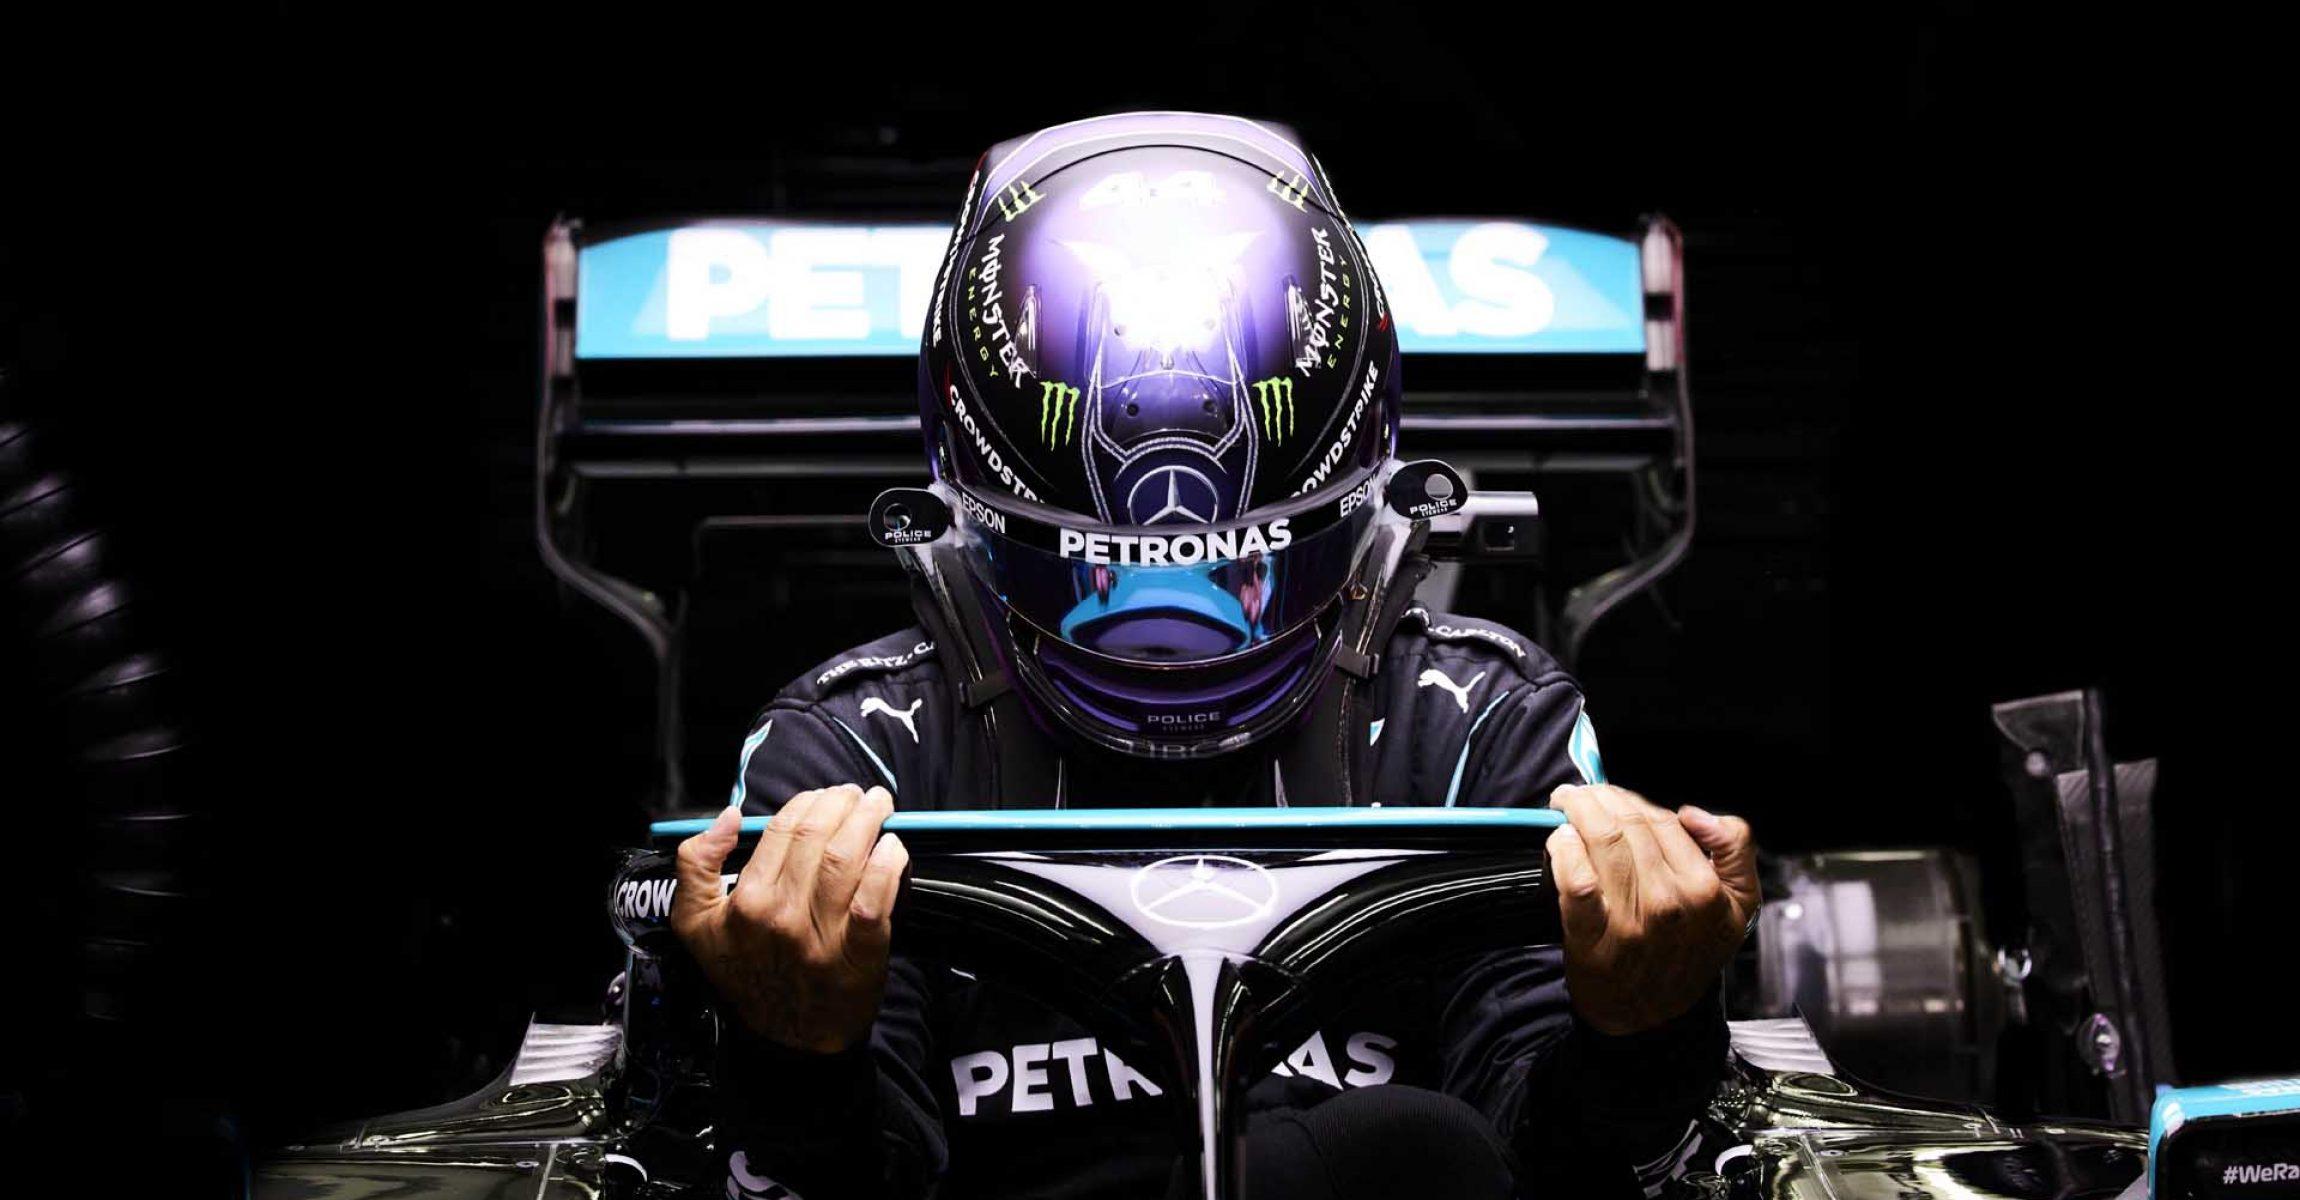 2021 Bahrain Grand Prix, Saturday - Steve Etherington Lewis Hamilton Mercedes